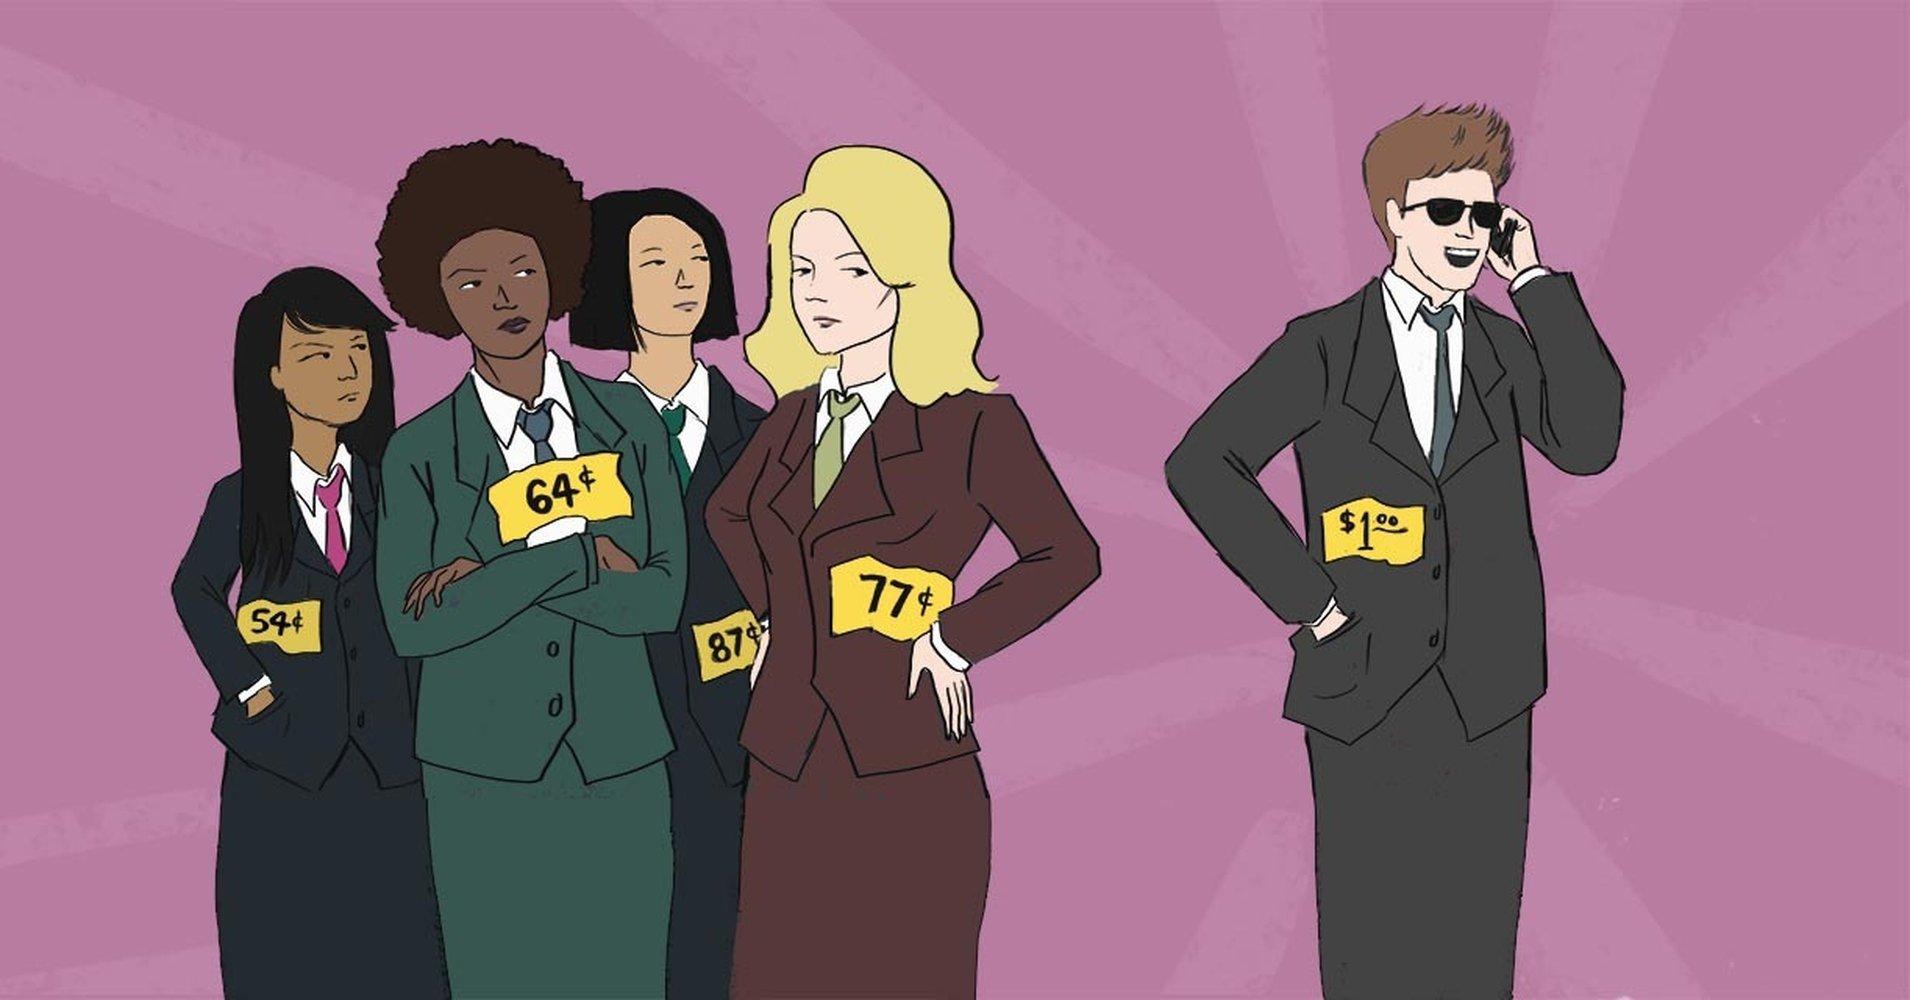 cartoon gender race wage gap.jpg